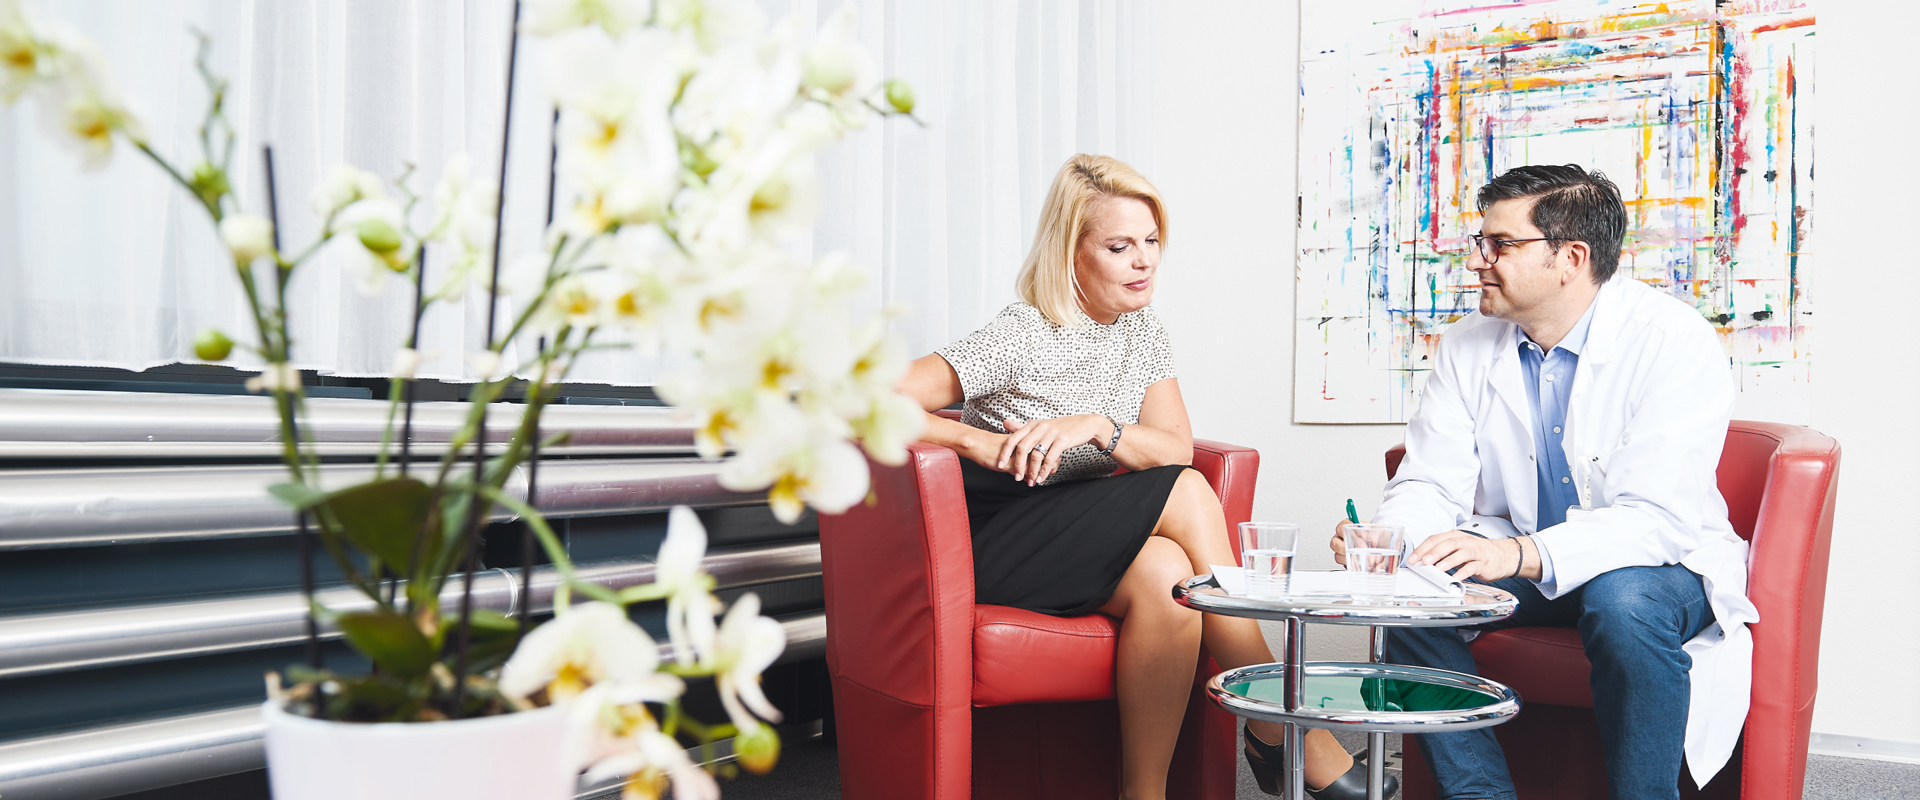 lic. phil. Marieke Kruit, Fachpsychologin im Gespräch mit Dr. med. Ramin Atefy, Psychiater